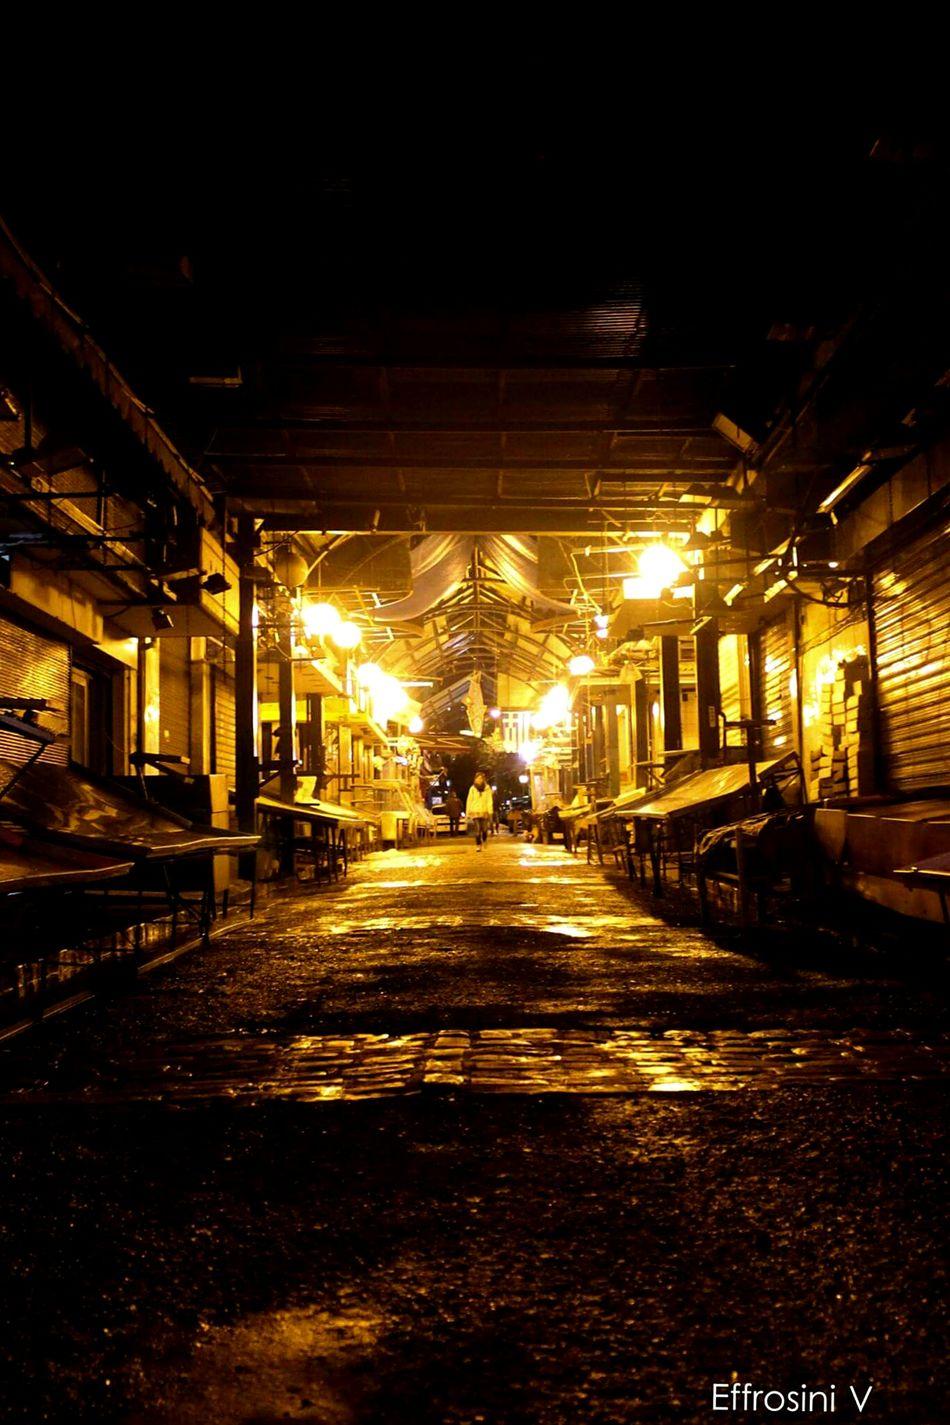 Market FishMarket Old Buildings Night Lights Architecture Street Photography Canon700dphotography CityWalk Thessaloniki Walks GREECE ♥♥